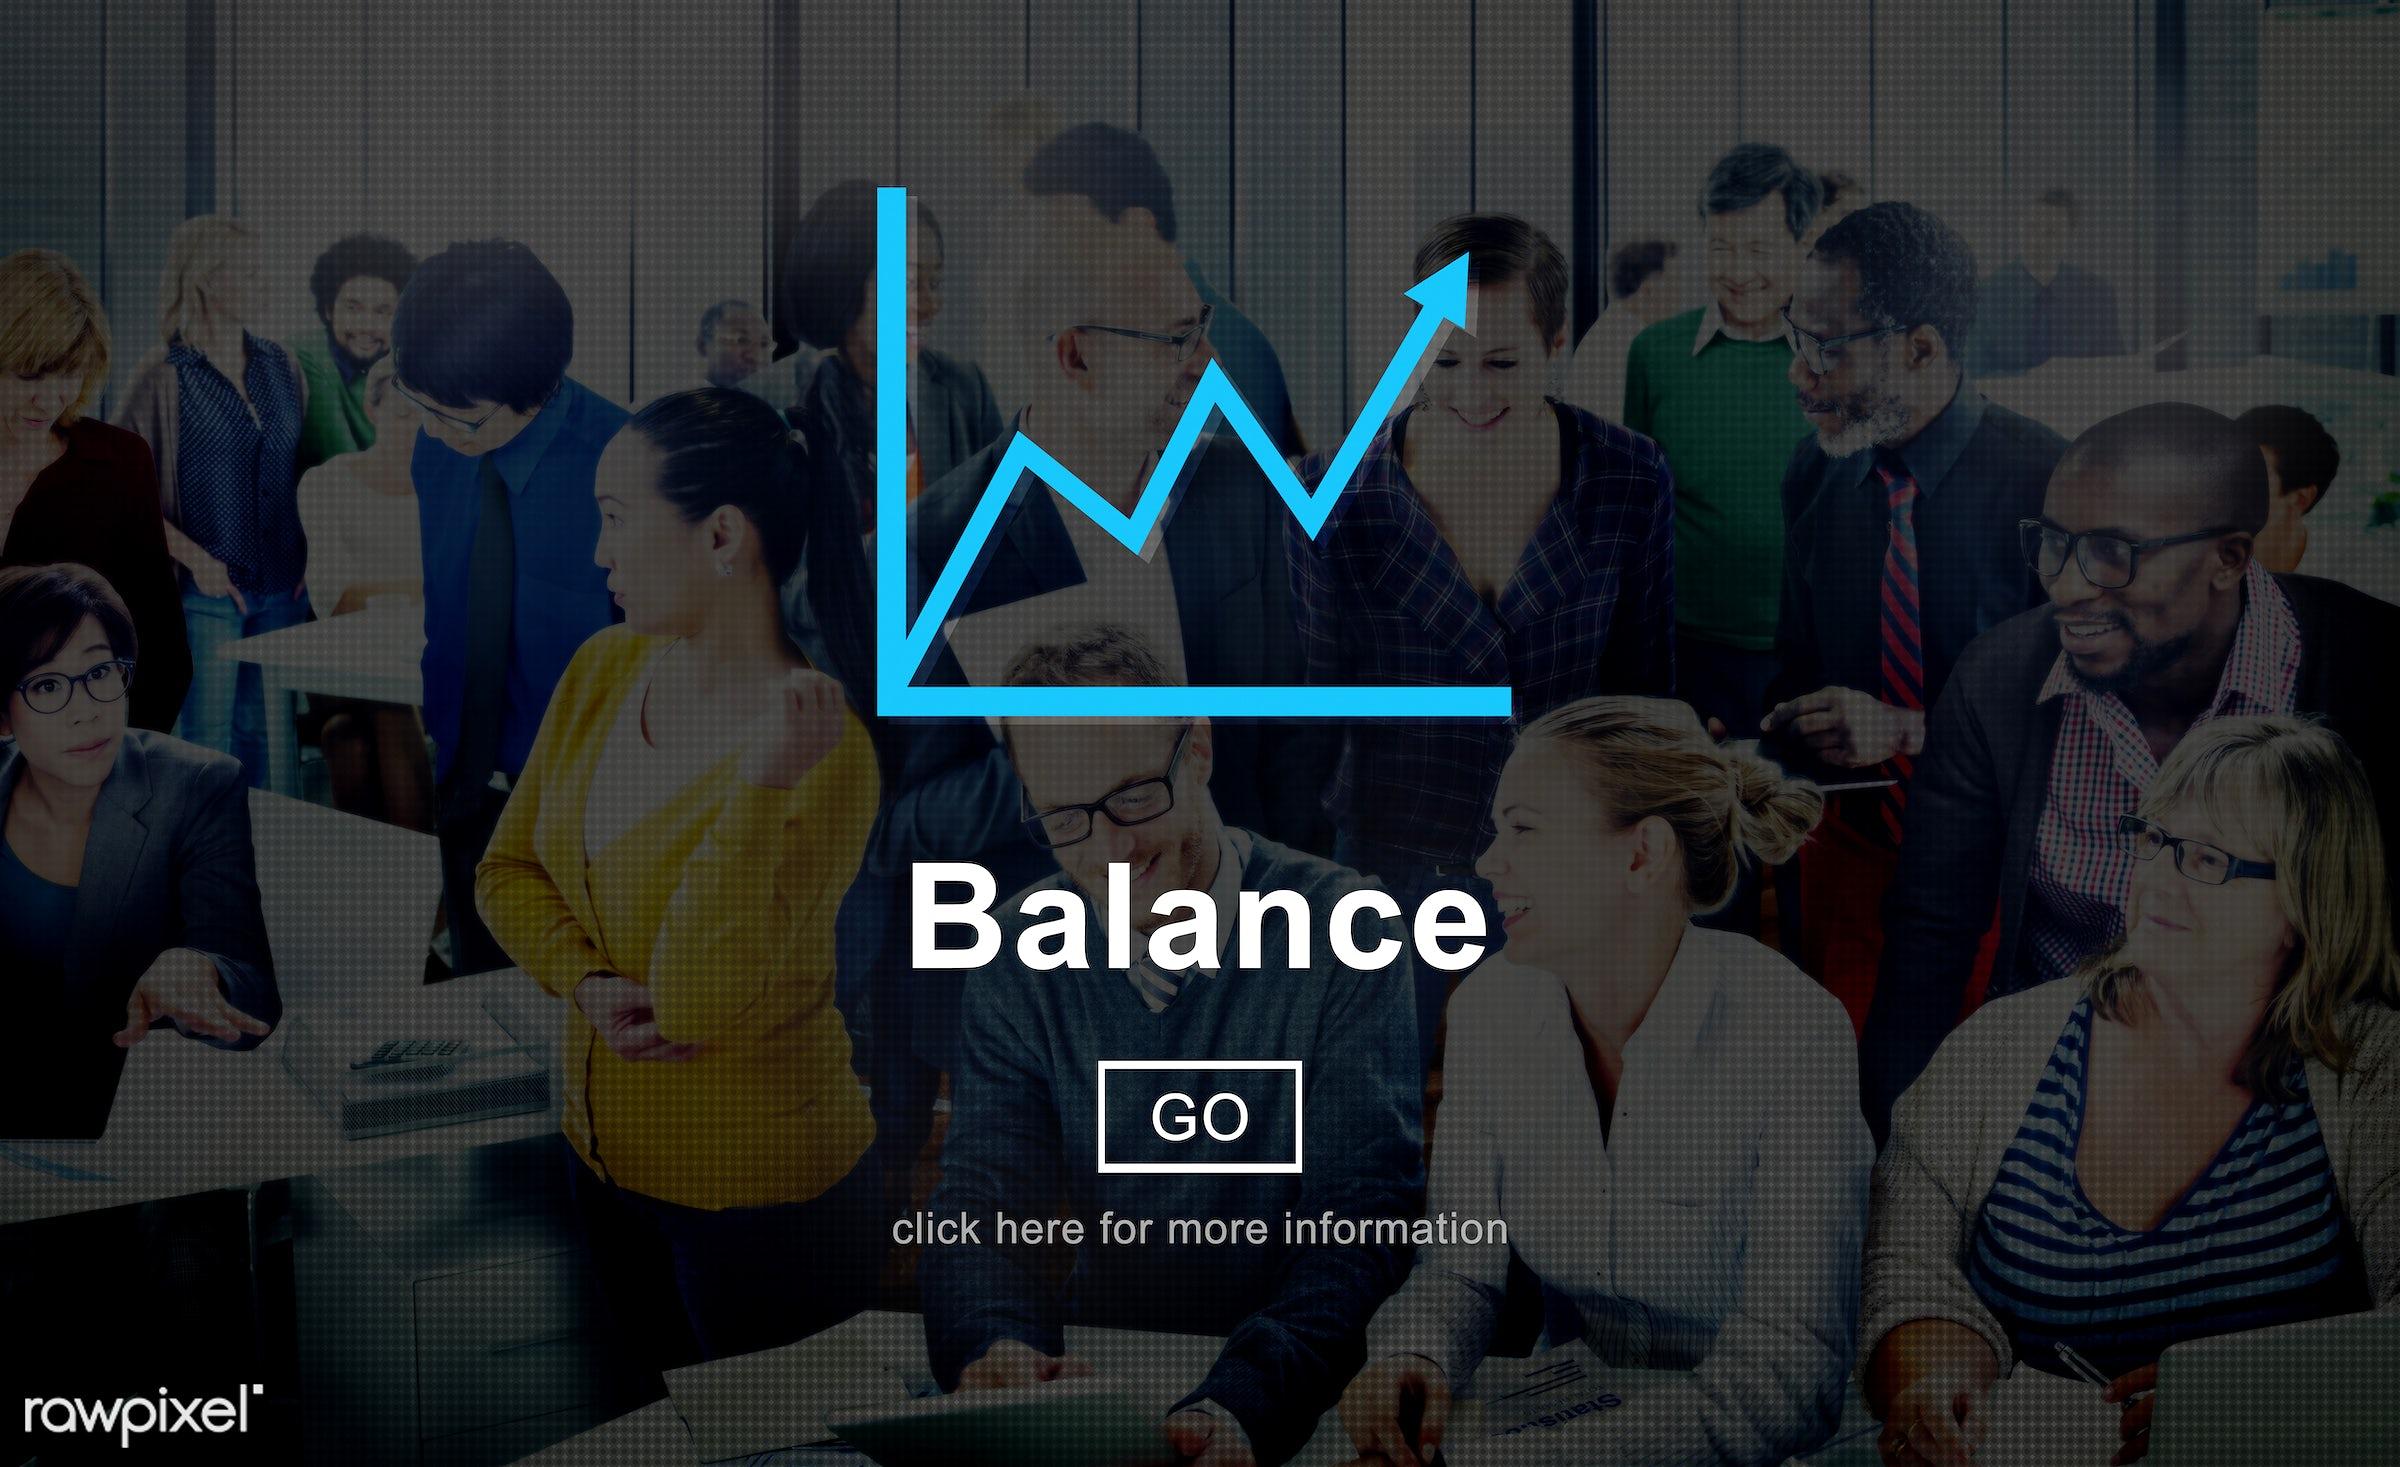 accounting, african descent, asian ethnicity, asset, audit, balance, banking, business, businessmen, businesswomen, busy,...